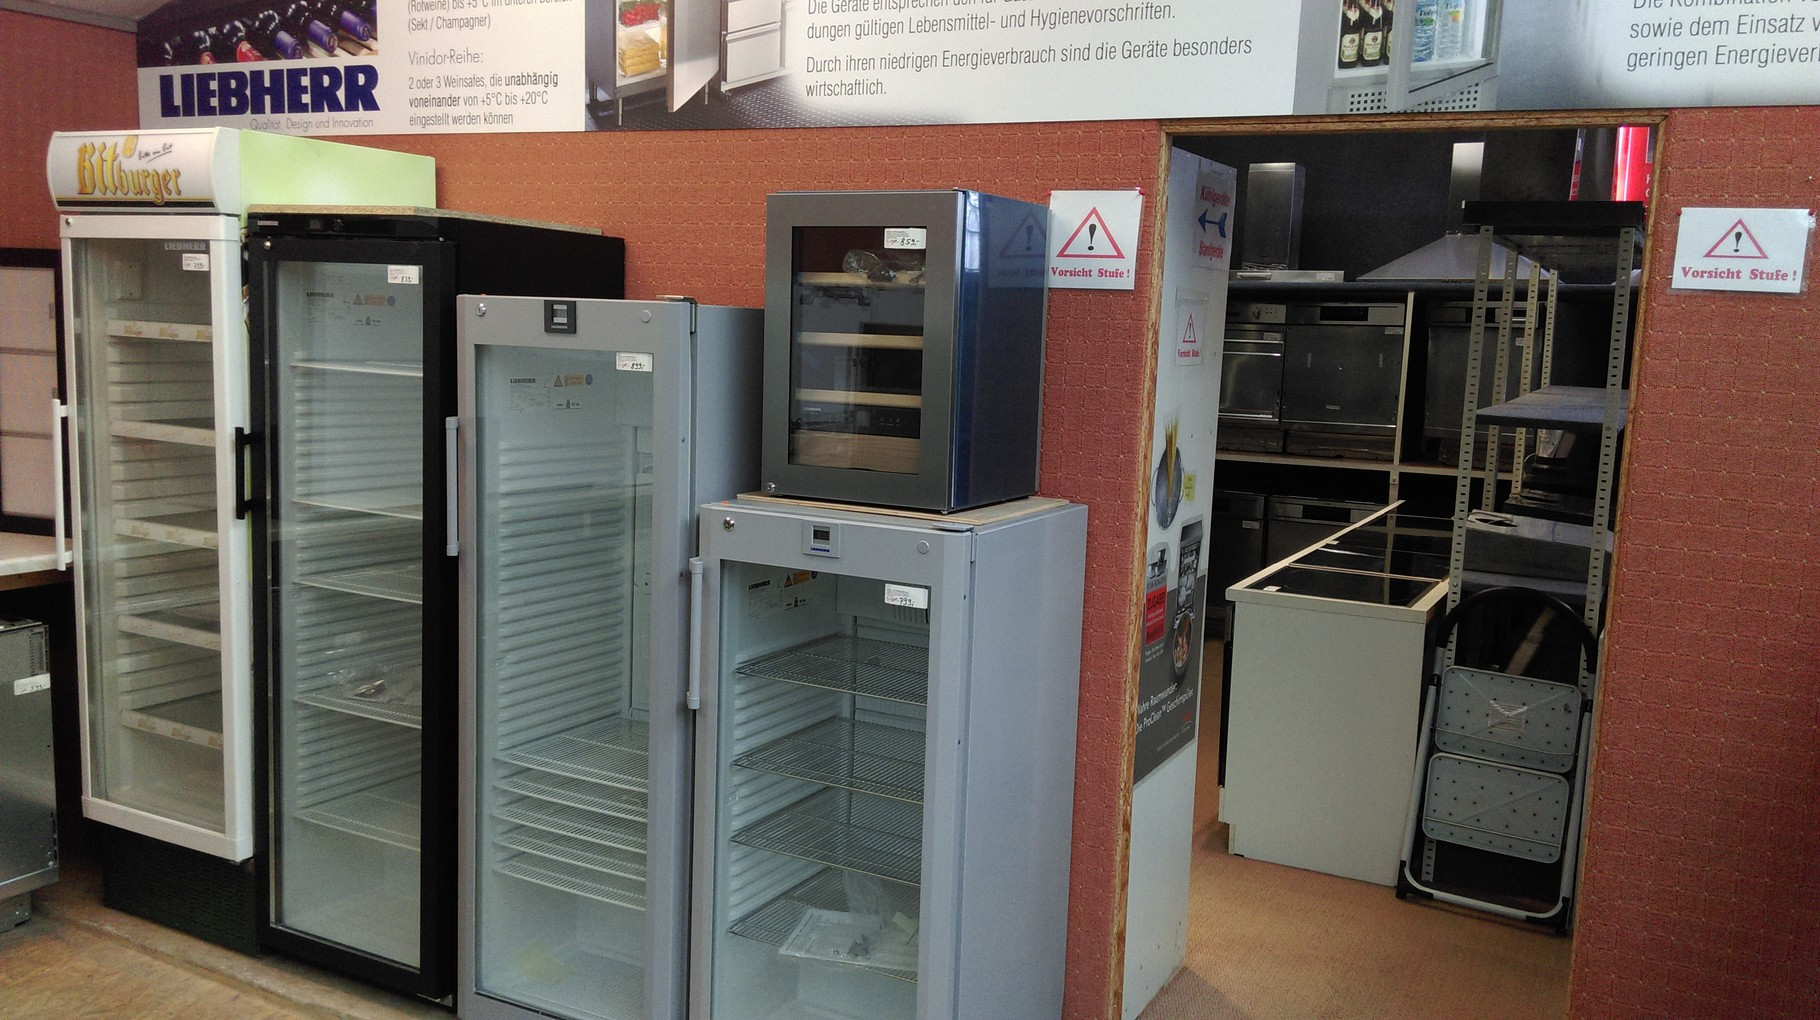 Küchengeräte Elektrogeräte Ausstellung Köln - HGS Elektro